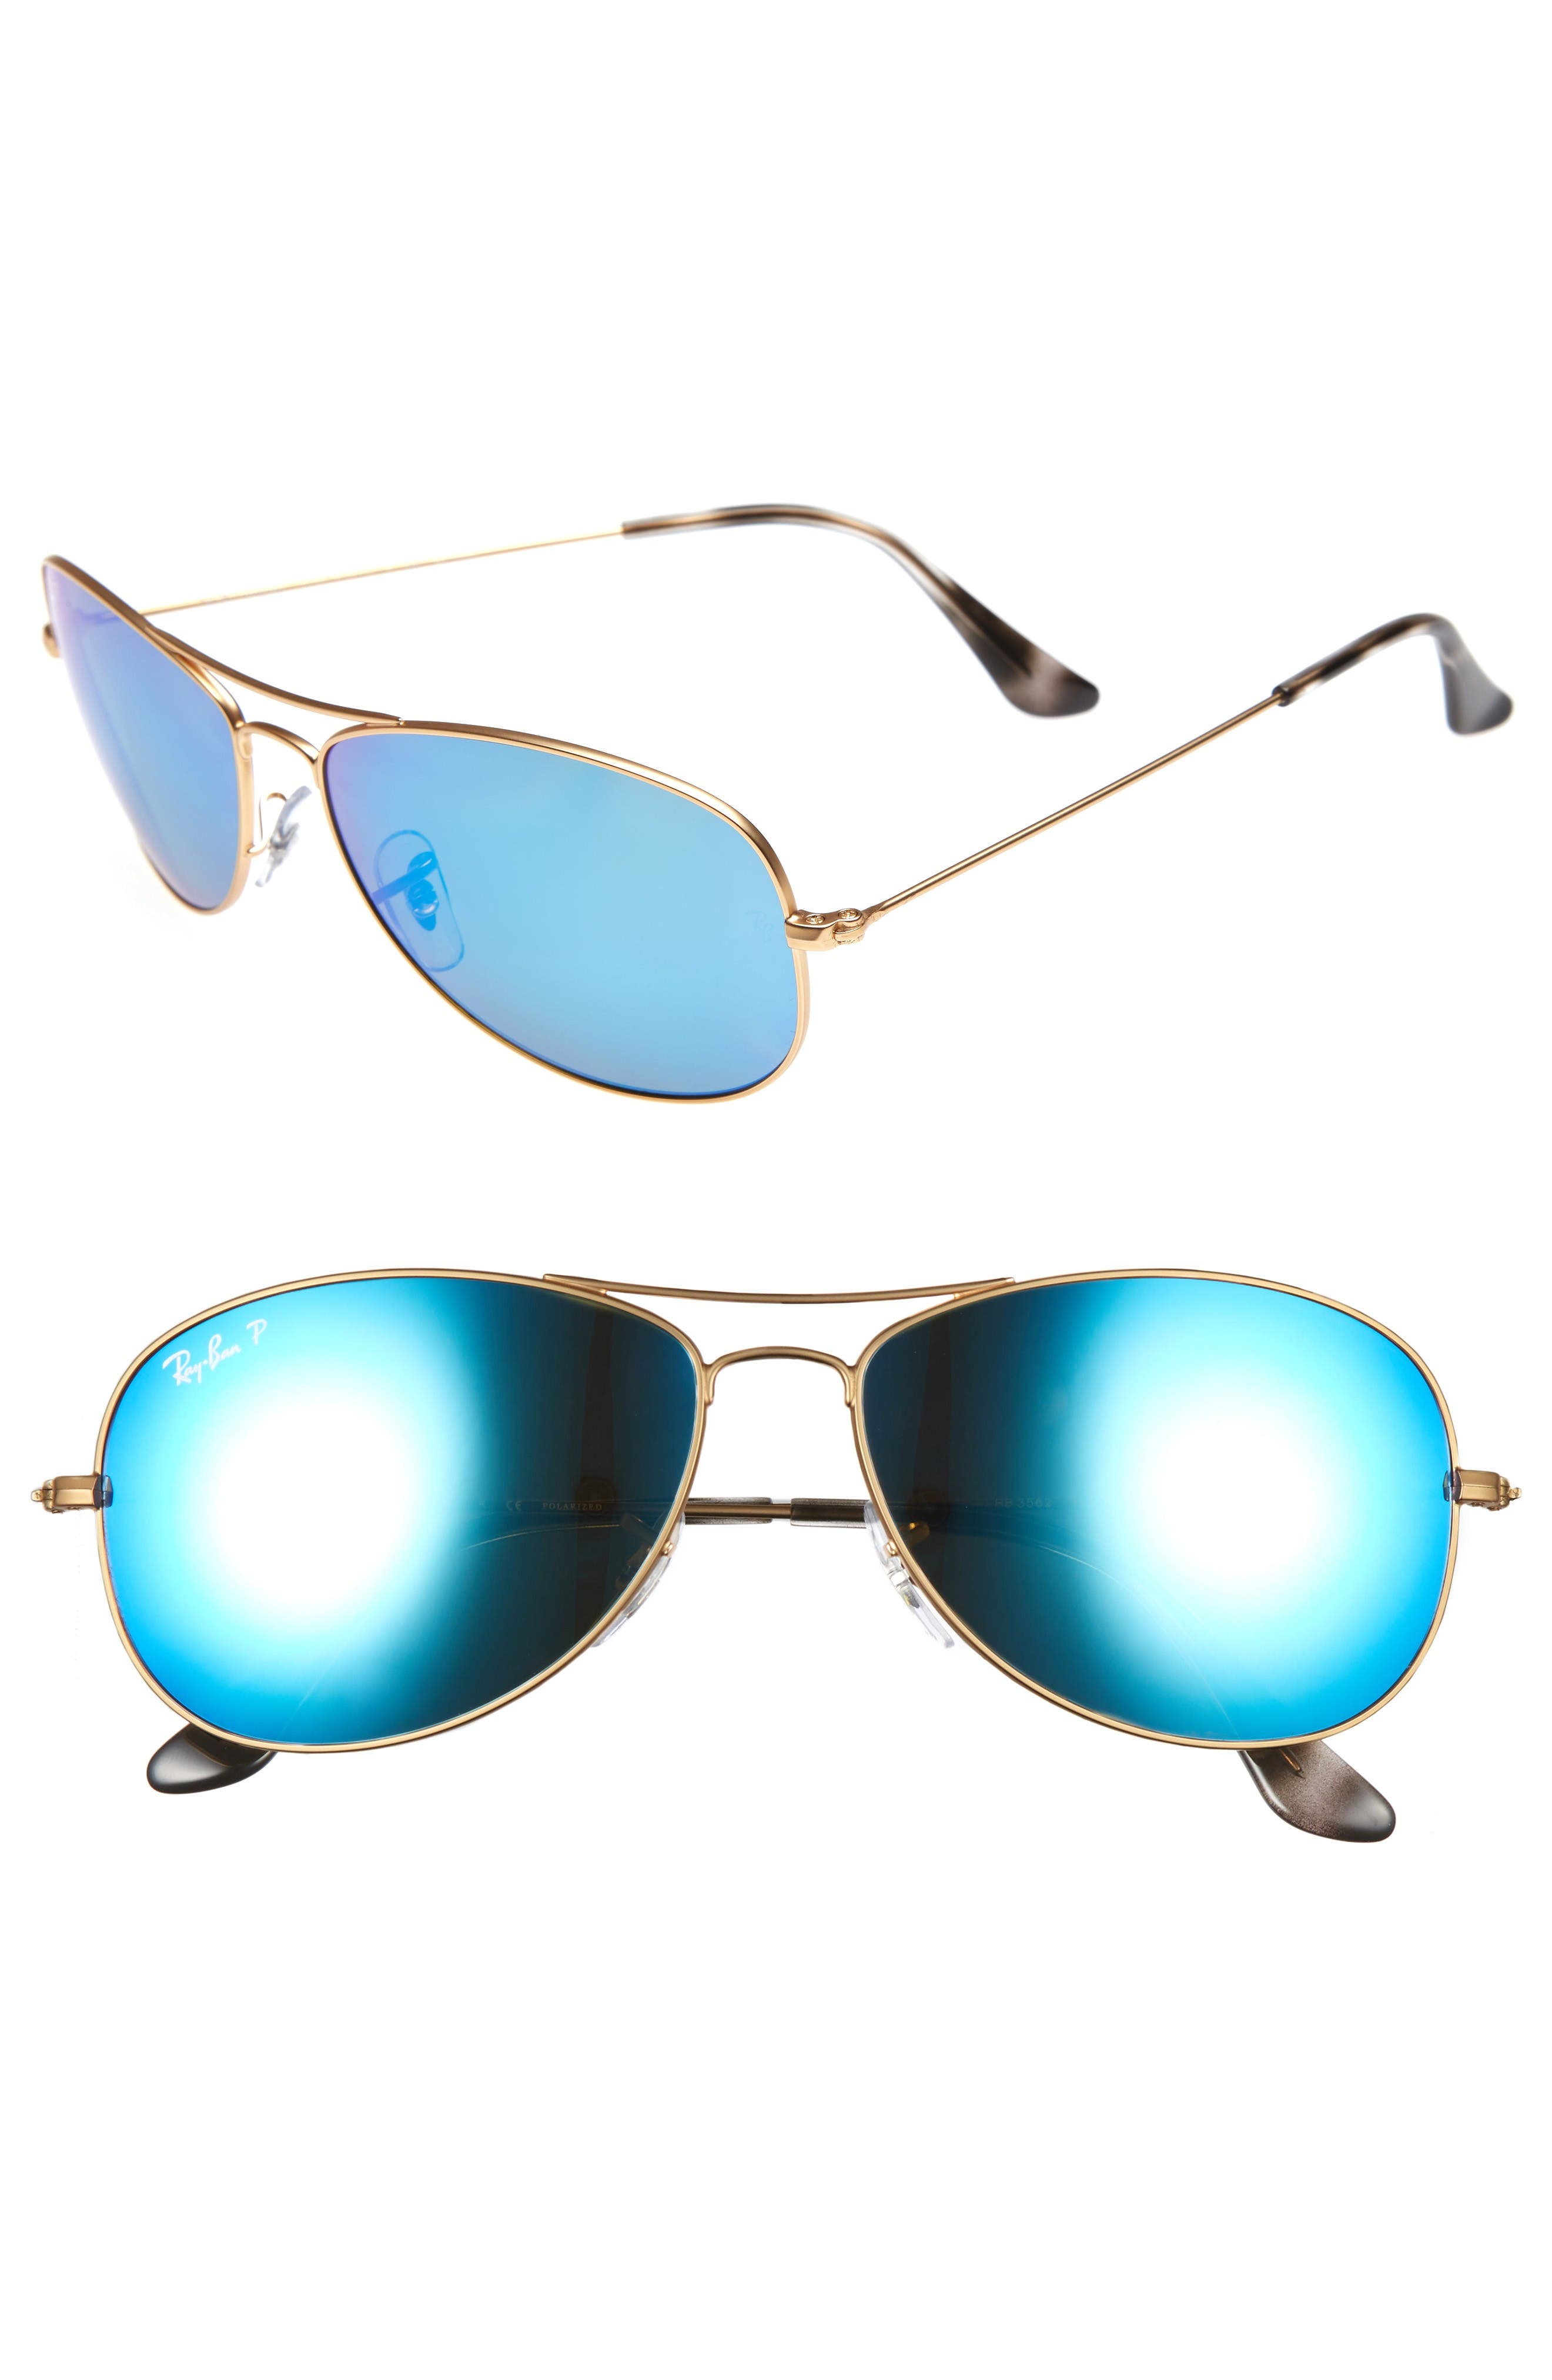 04703906003 RAY BAN 59MM CHROMANCE AVIATOR SUNGLASSES - GOLD  BLUE GREEN